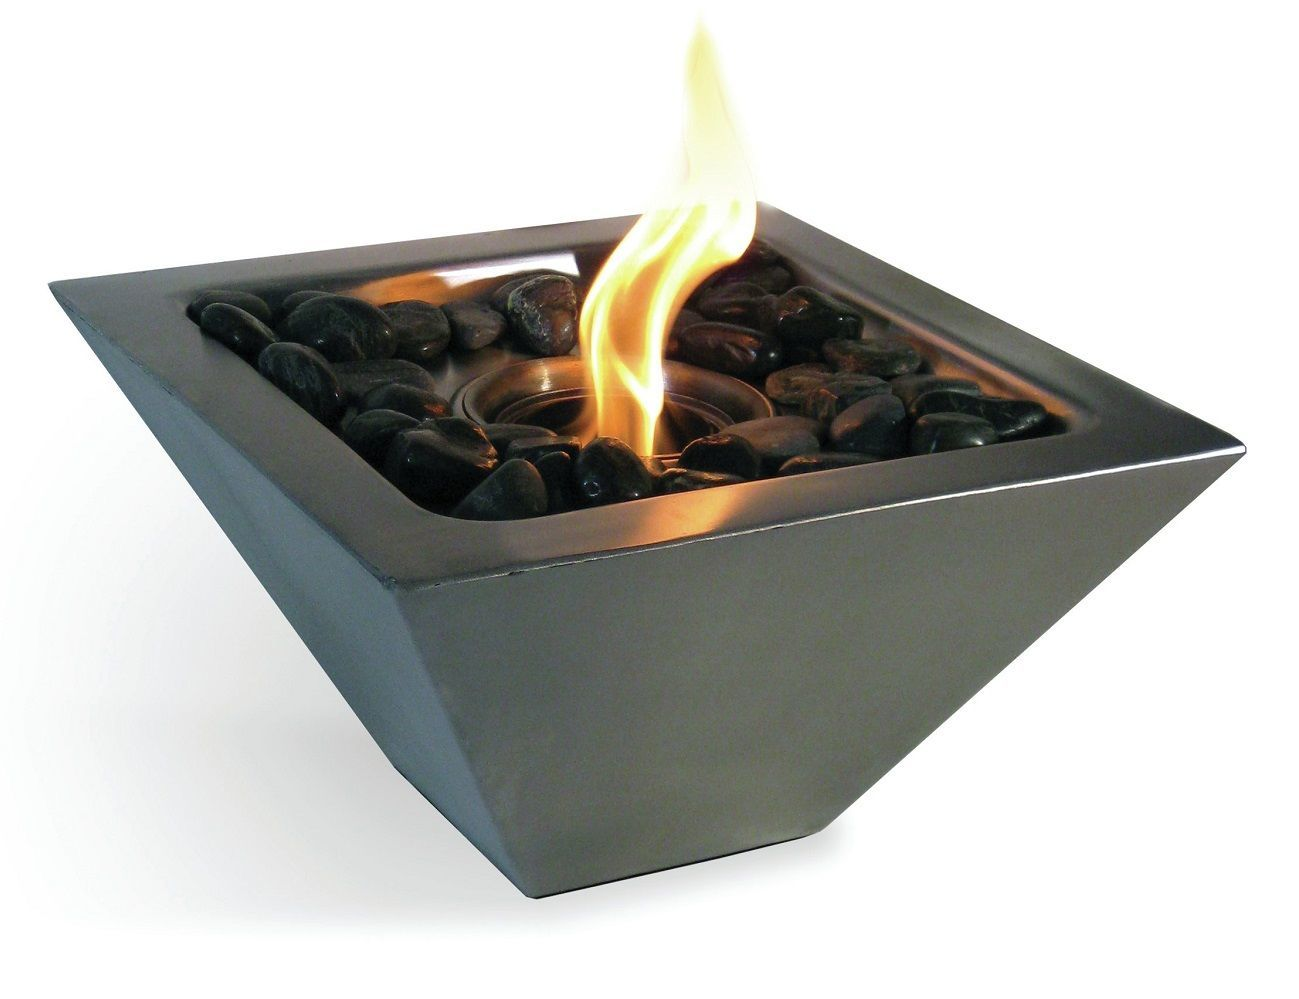 Indoor outdoor tabletop fireplace gadget flow for Bio ethanol fire pit